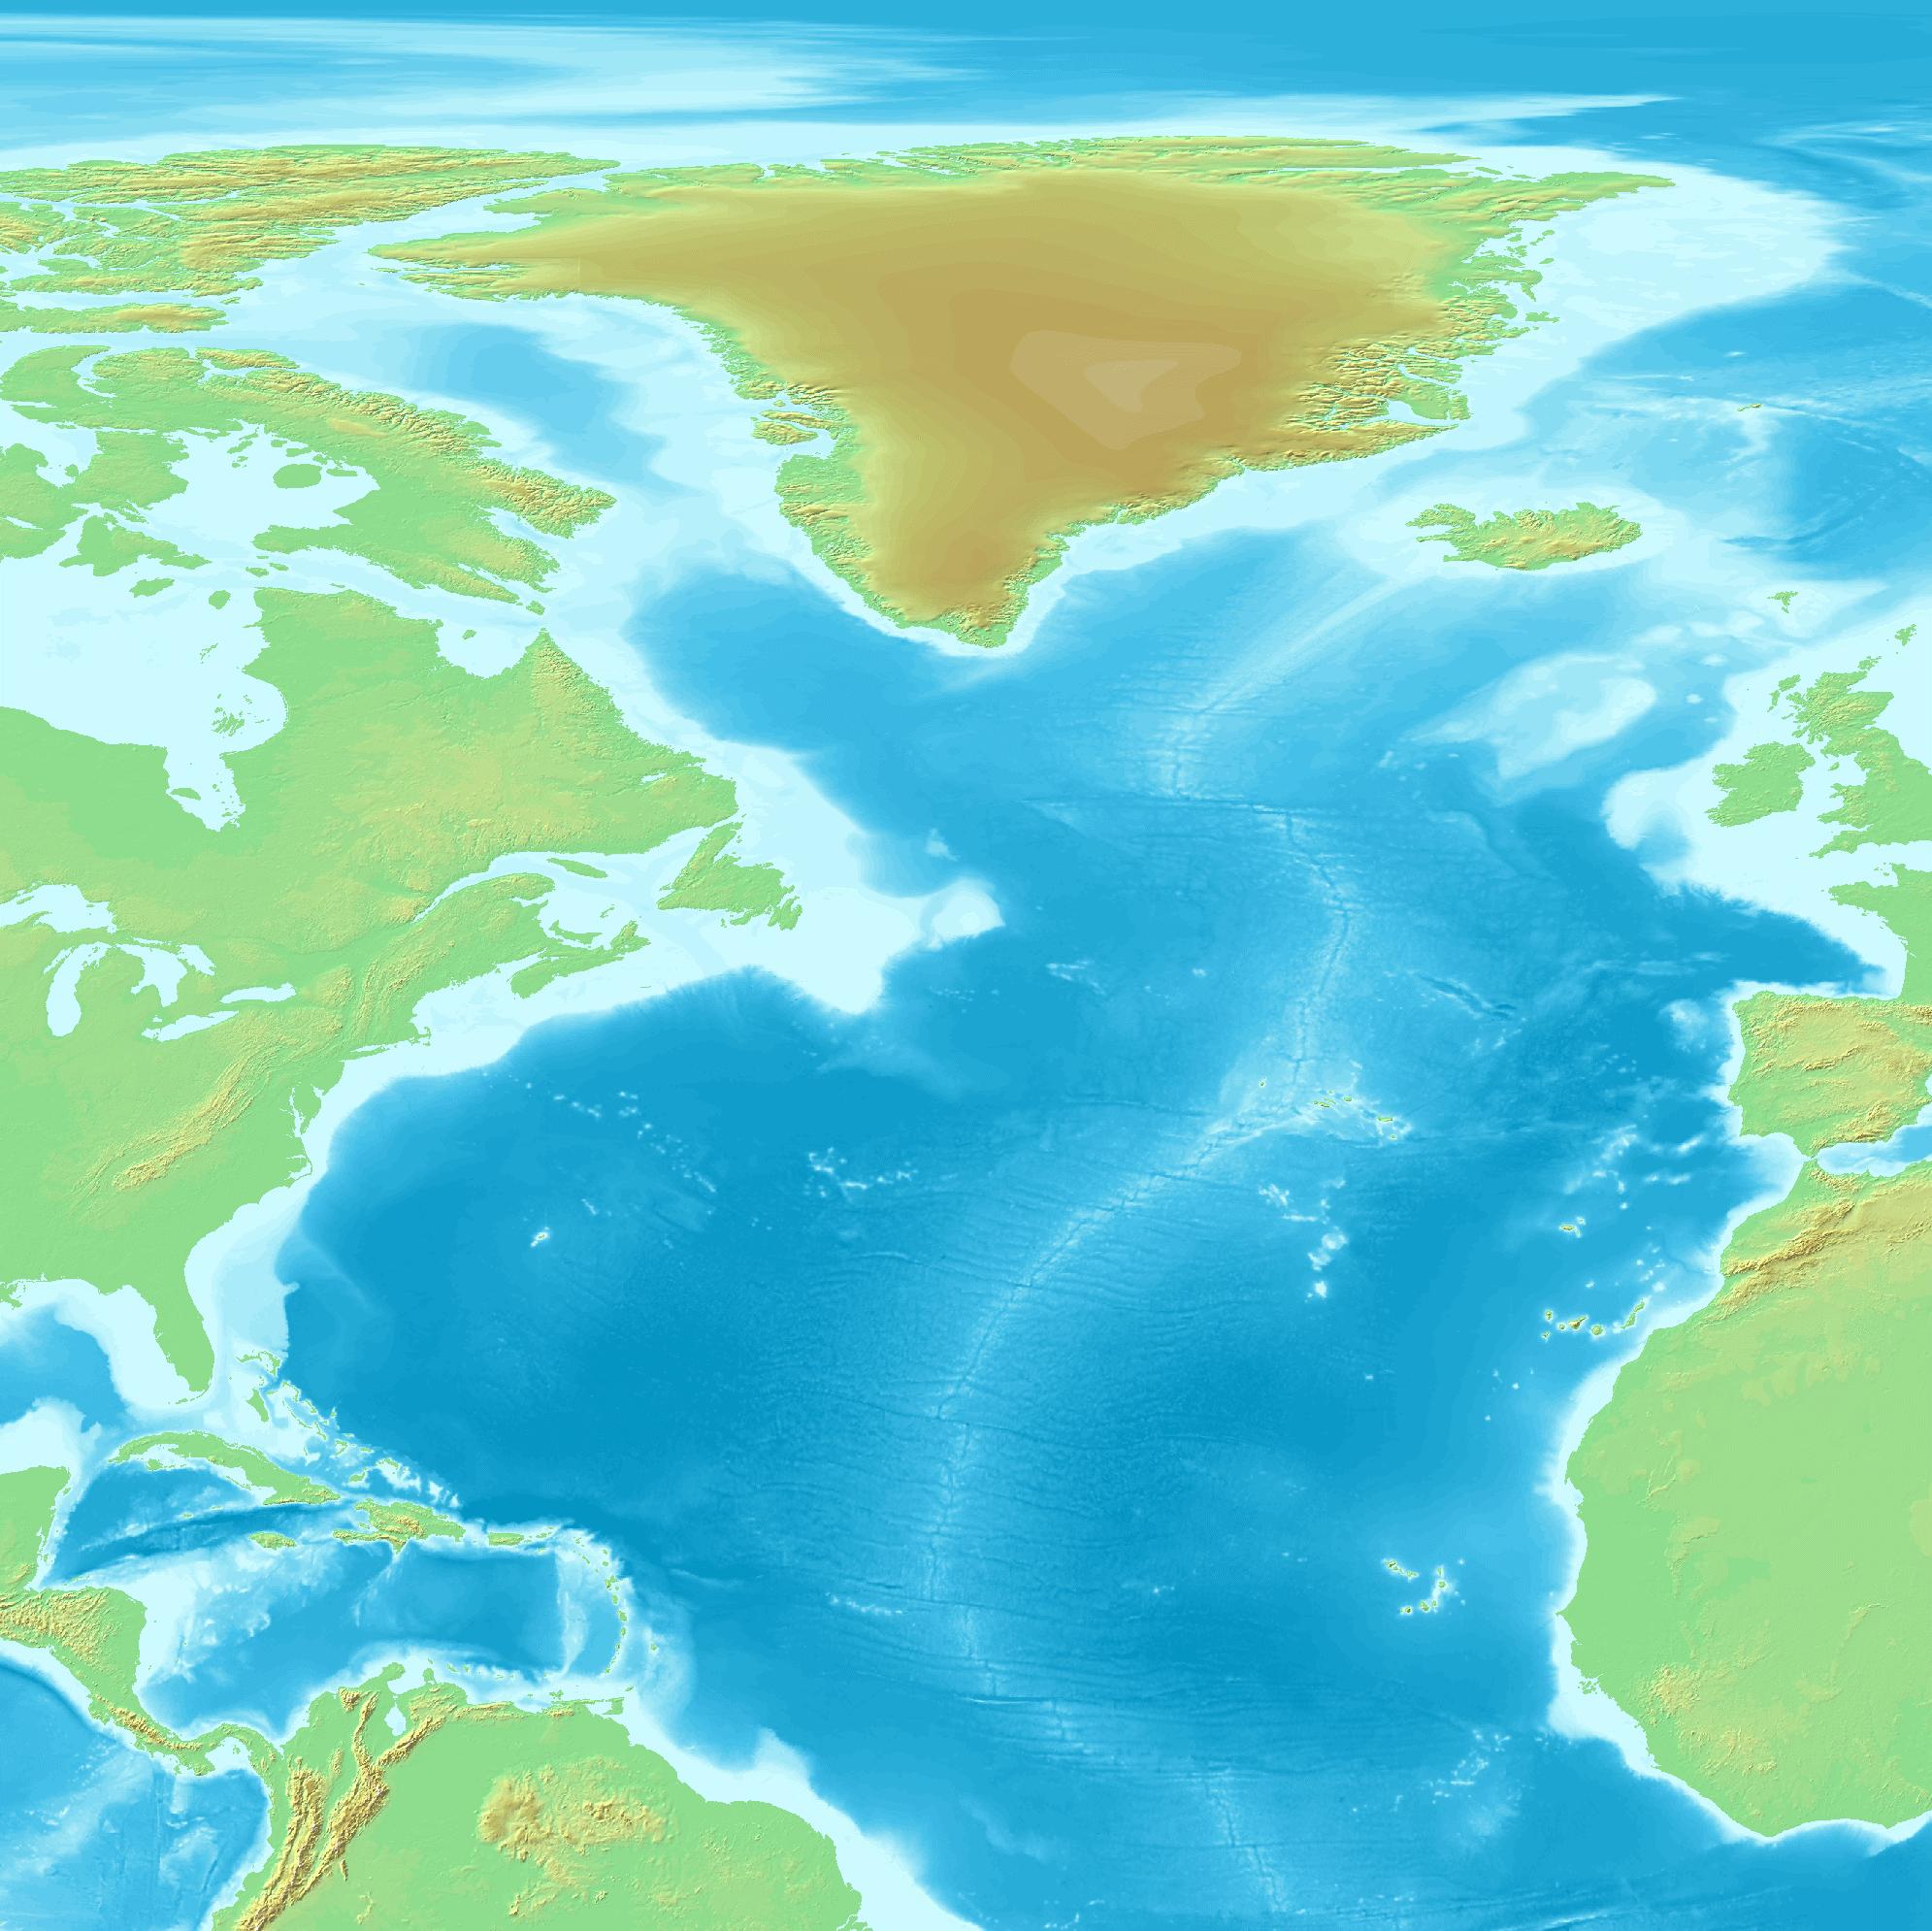 конкуренцию картинки карты атлантического океана бумаги сладковатый, поэтому